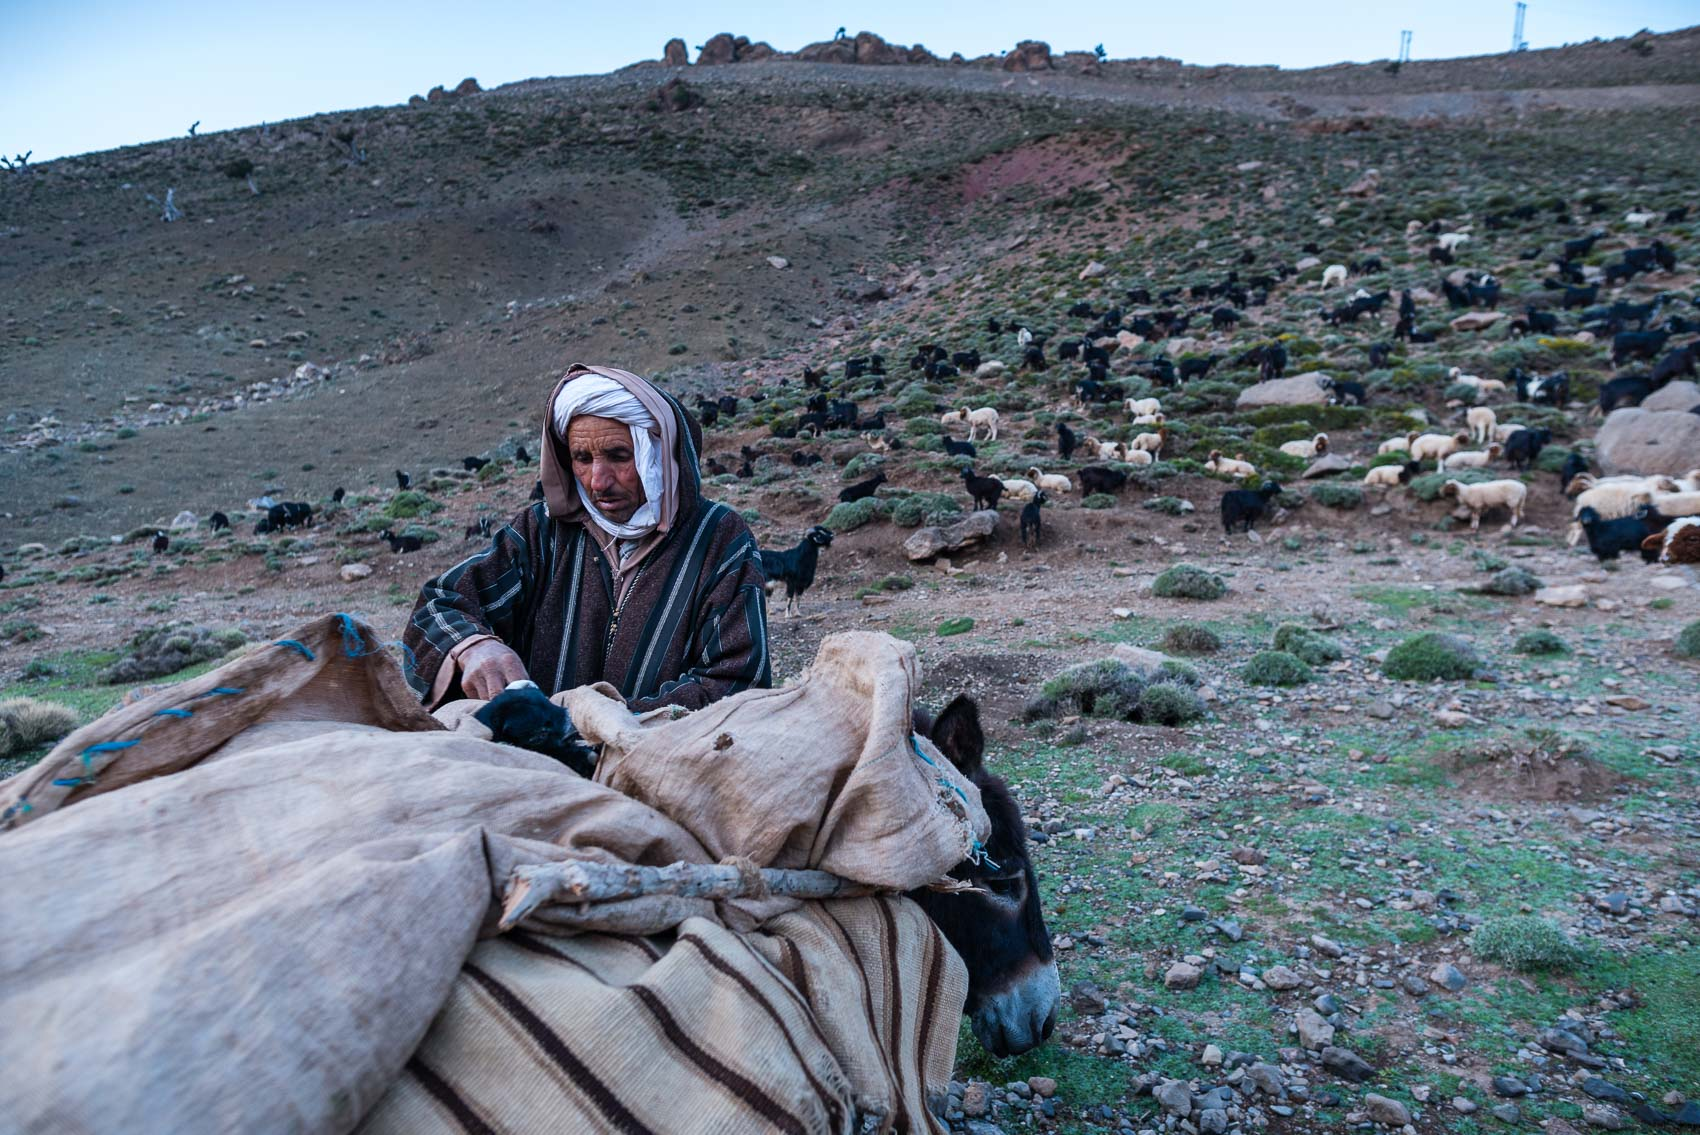 Hmad, Ait Atta nomads, Morocco